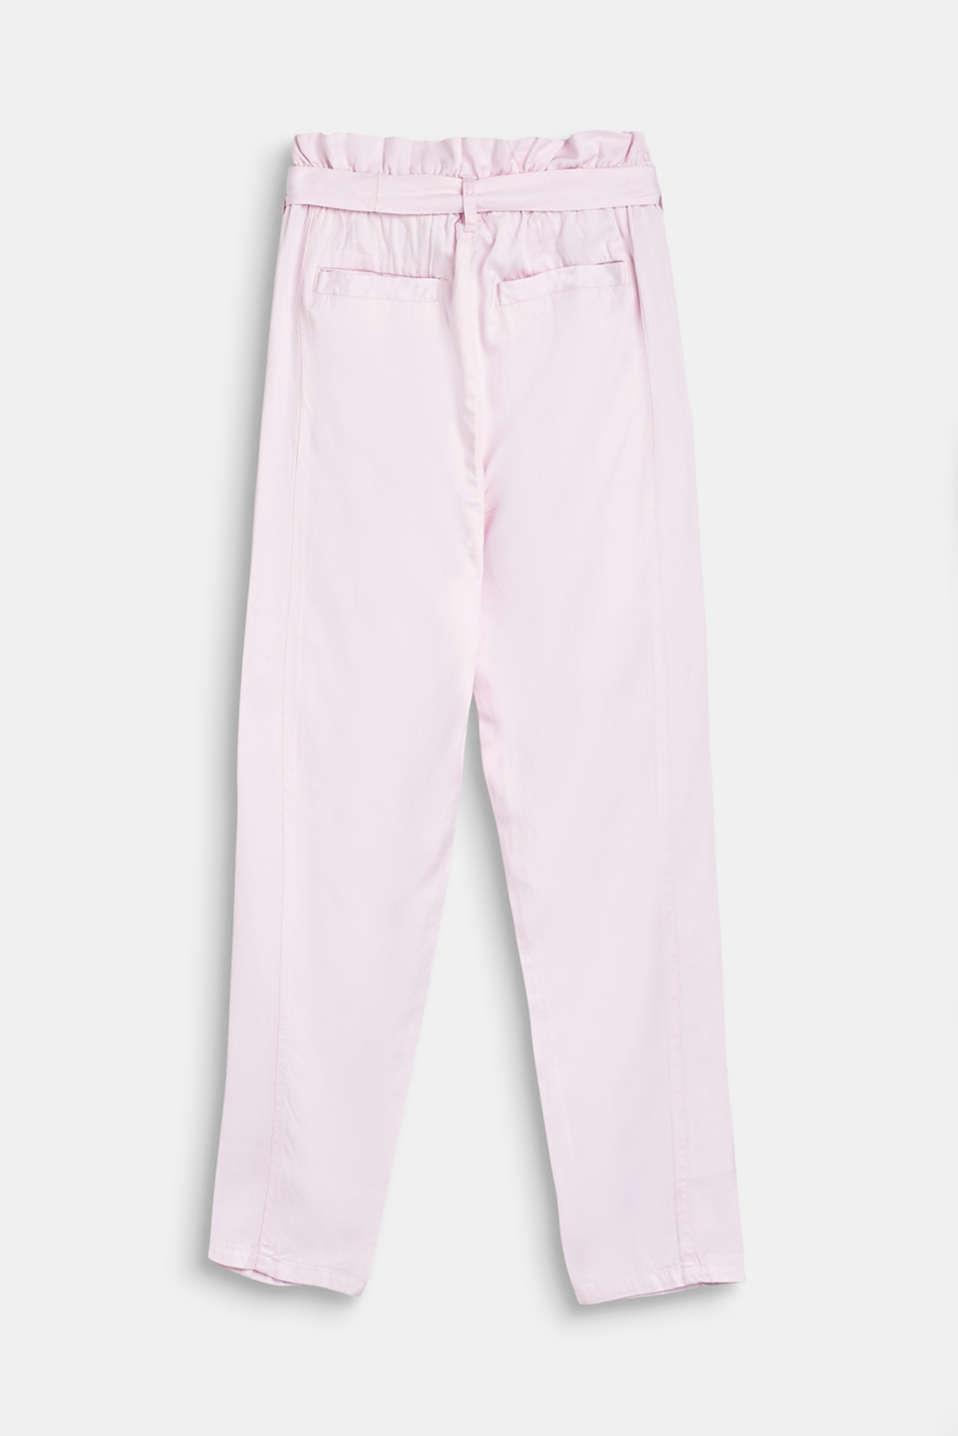 Pants woven, LCBLUSH, detail image number 1